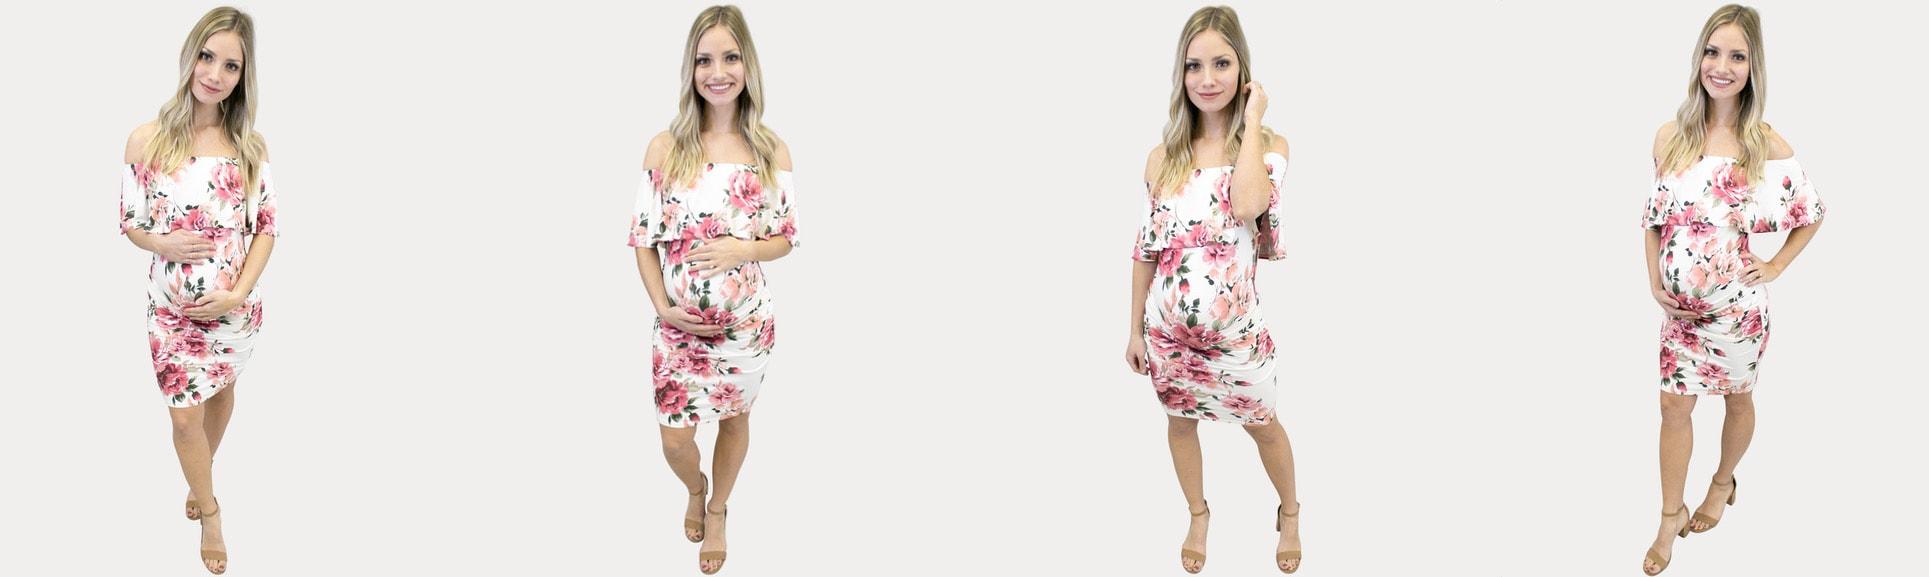 Off the shoulder maternity florals